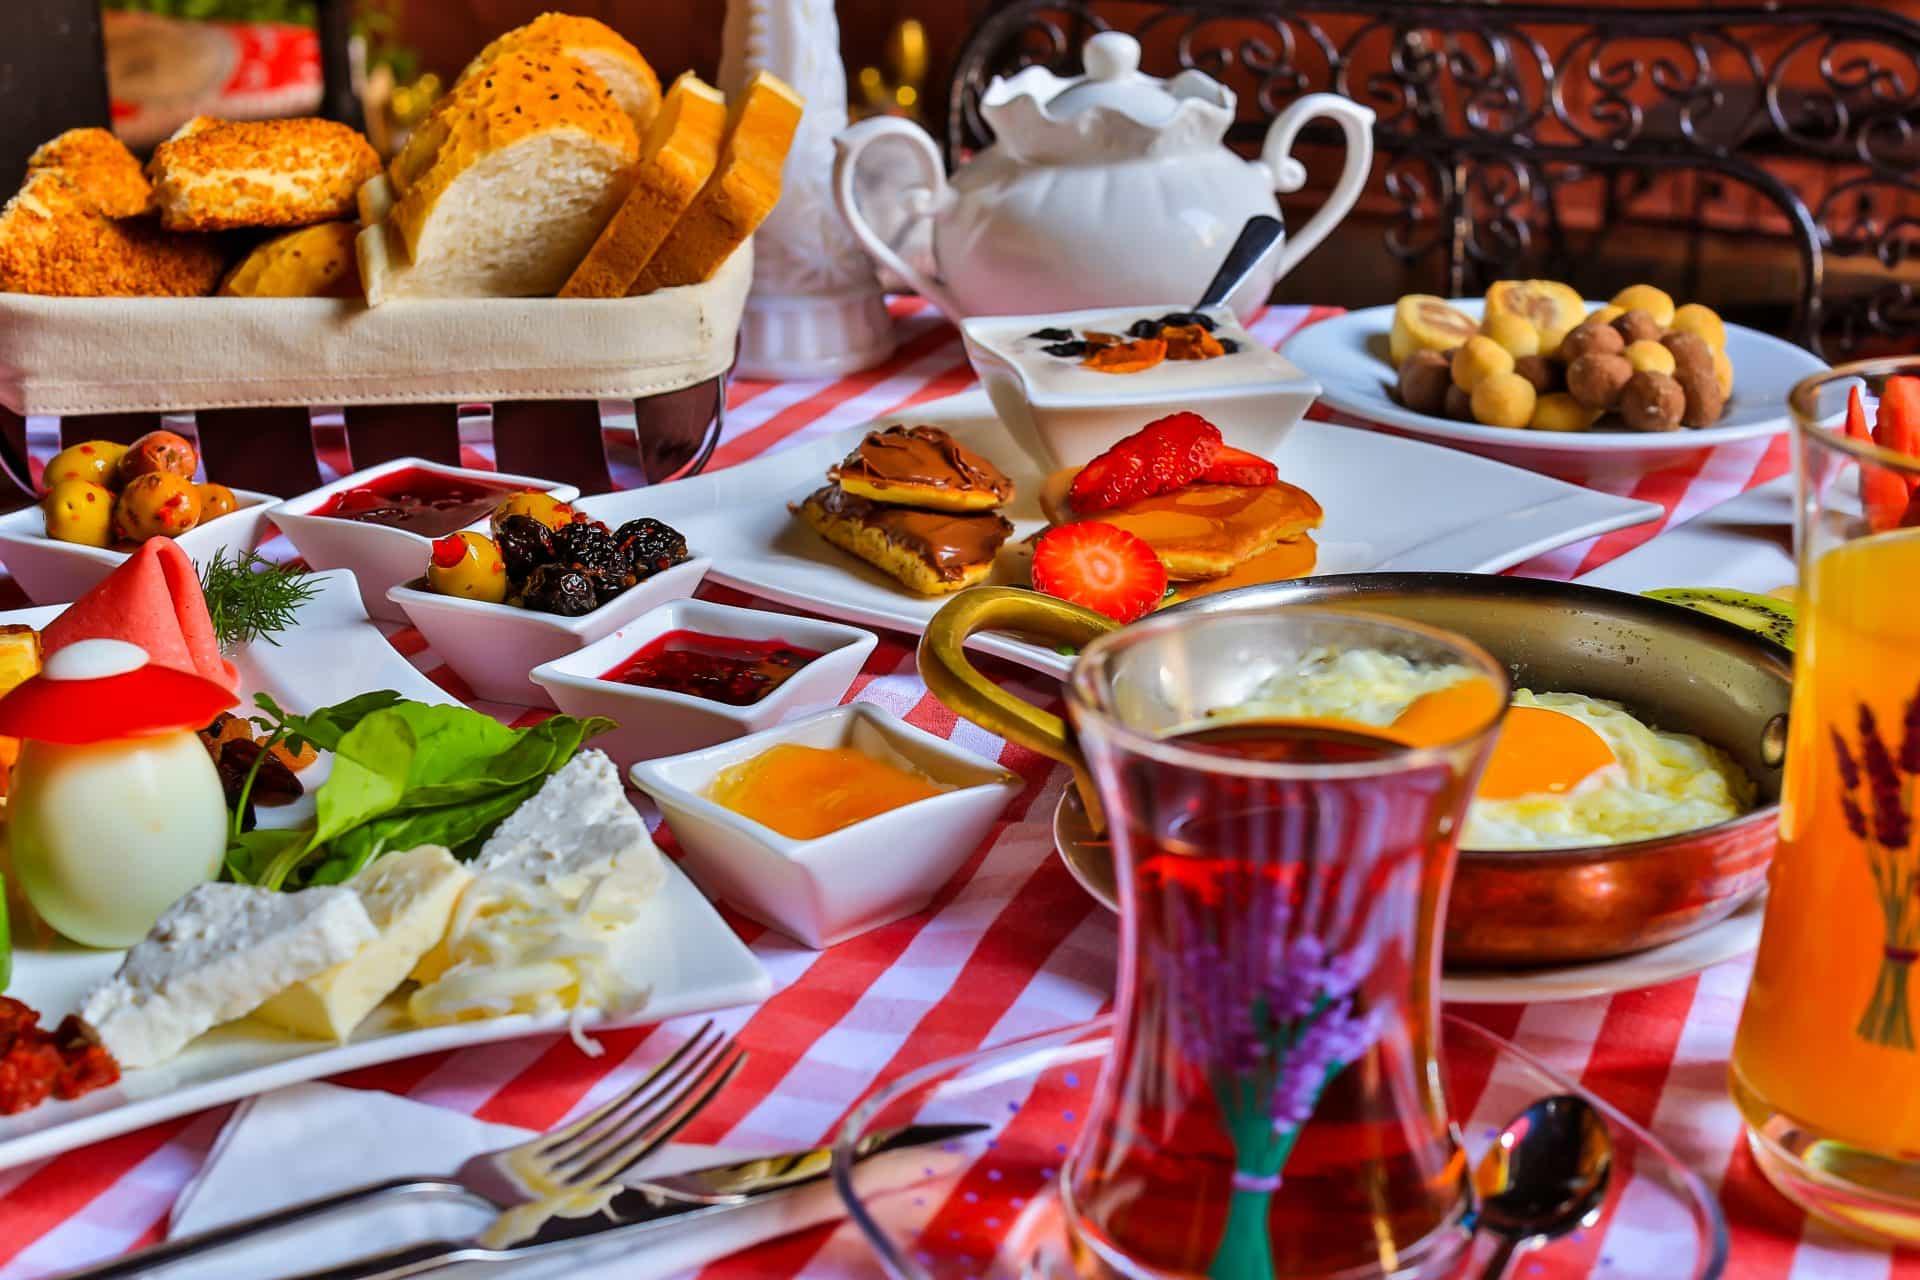 Cihangir Organik Kahvaltı, Cihangir Açık Büfe Kahvaltı